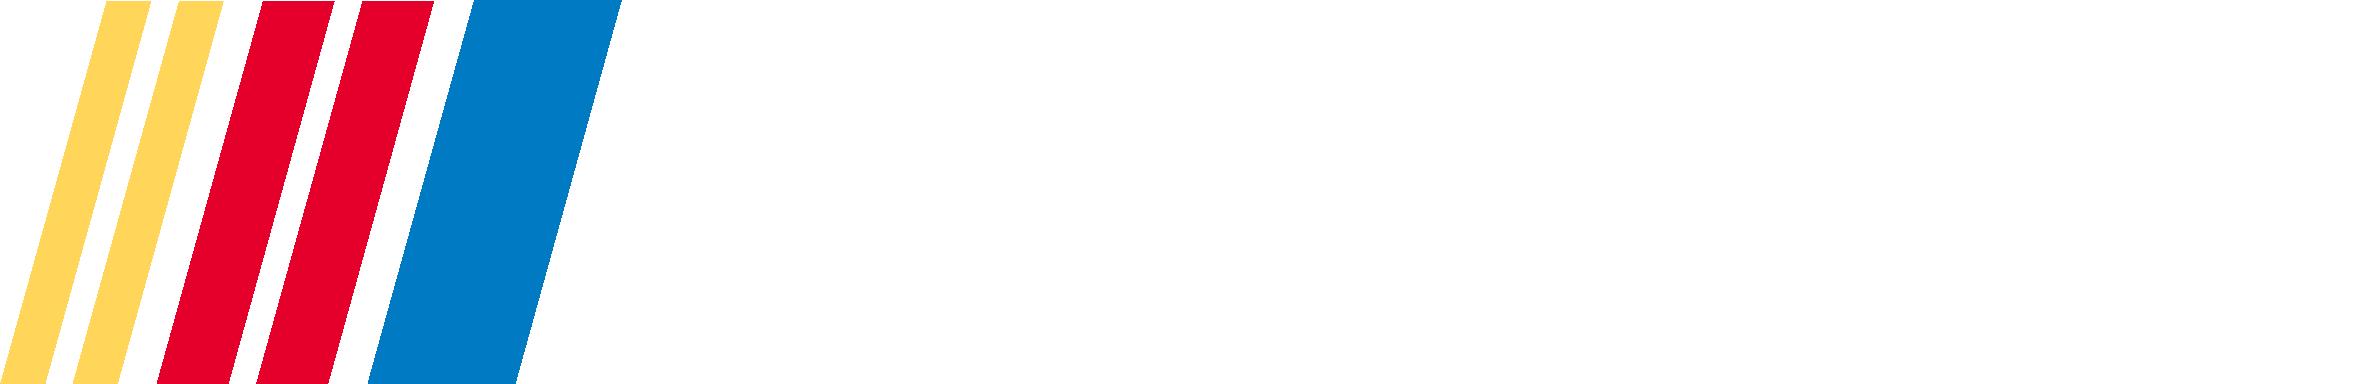 New logos rule login. Nascar clipart book